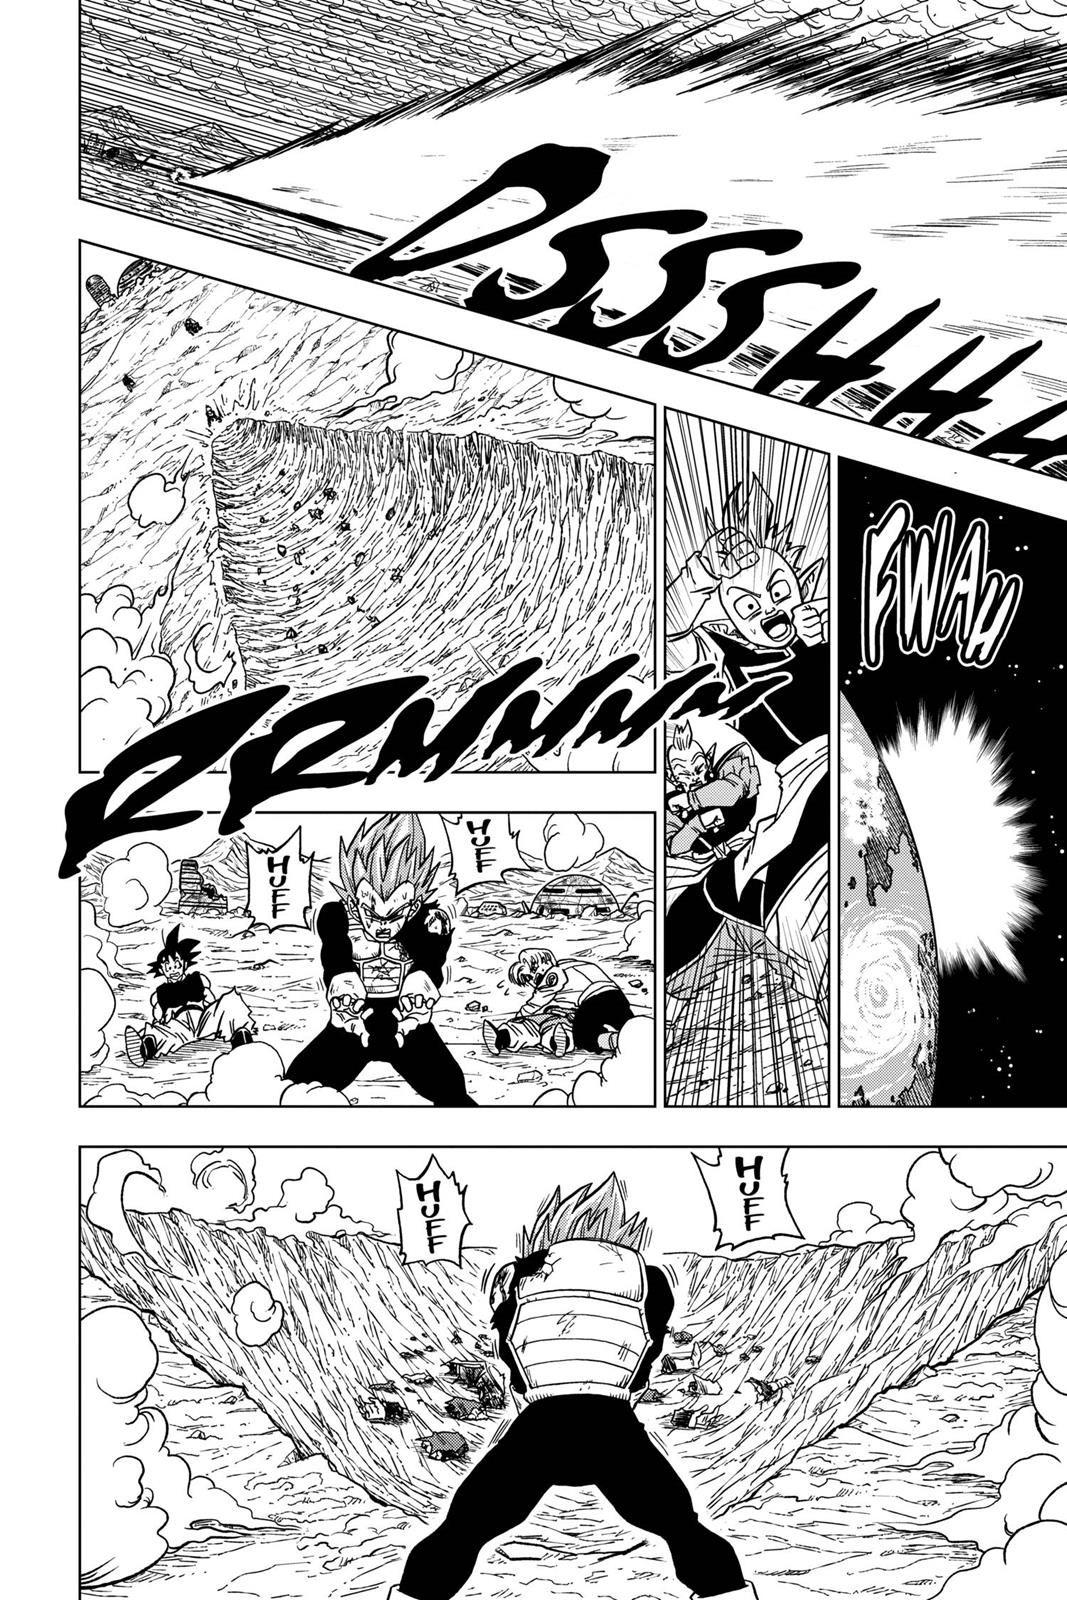 Dragon Ball Super Chapter 025 In 2020 Dragon Ball Super Dragon Ball Dragon Ball Super Manga